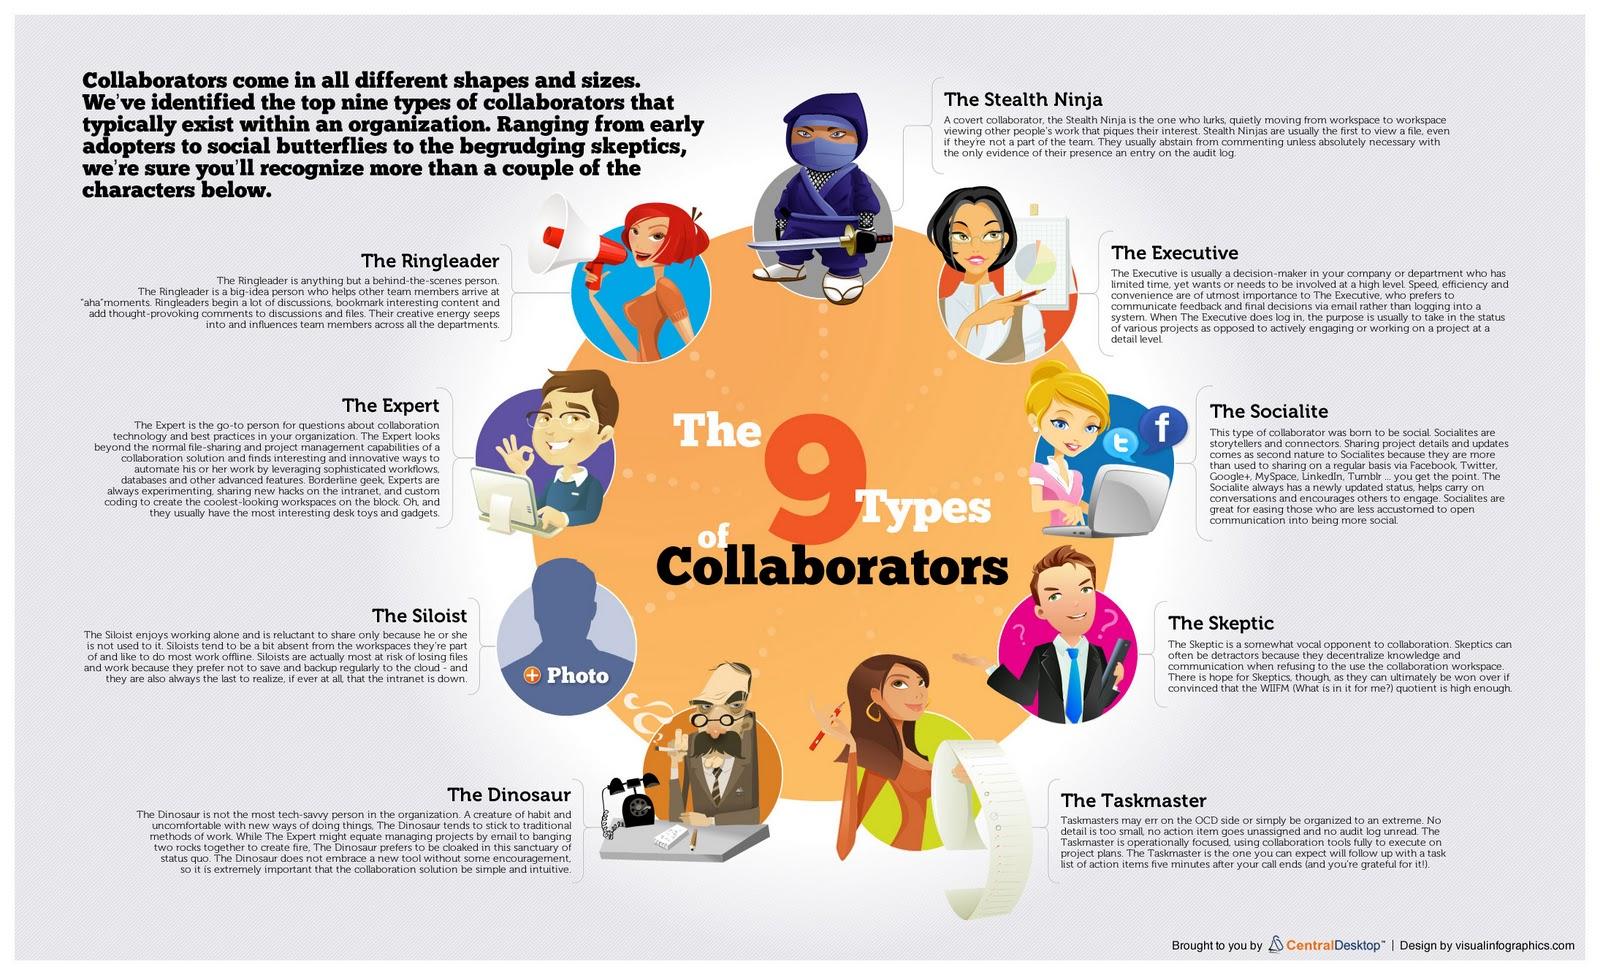 sources and methods types of collaborators centraldesktop com centraldesktop com infographics collaboration personas the 9 types of collaborators jpg